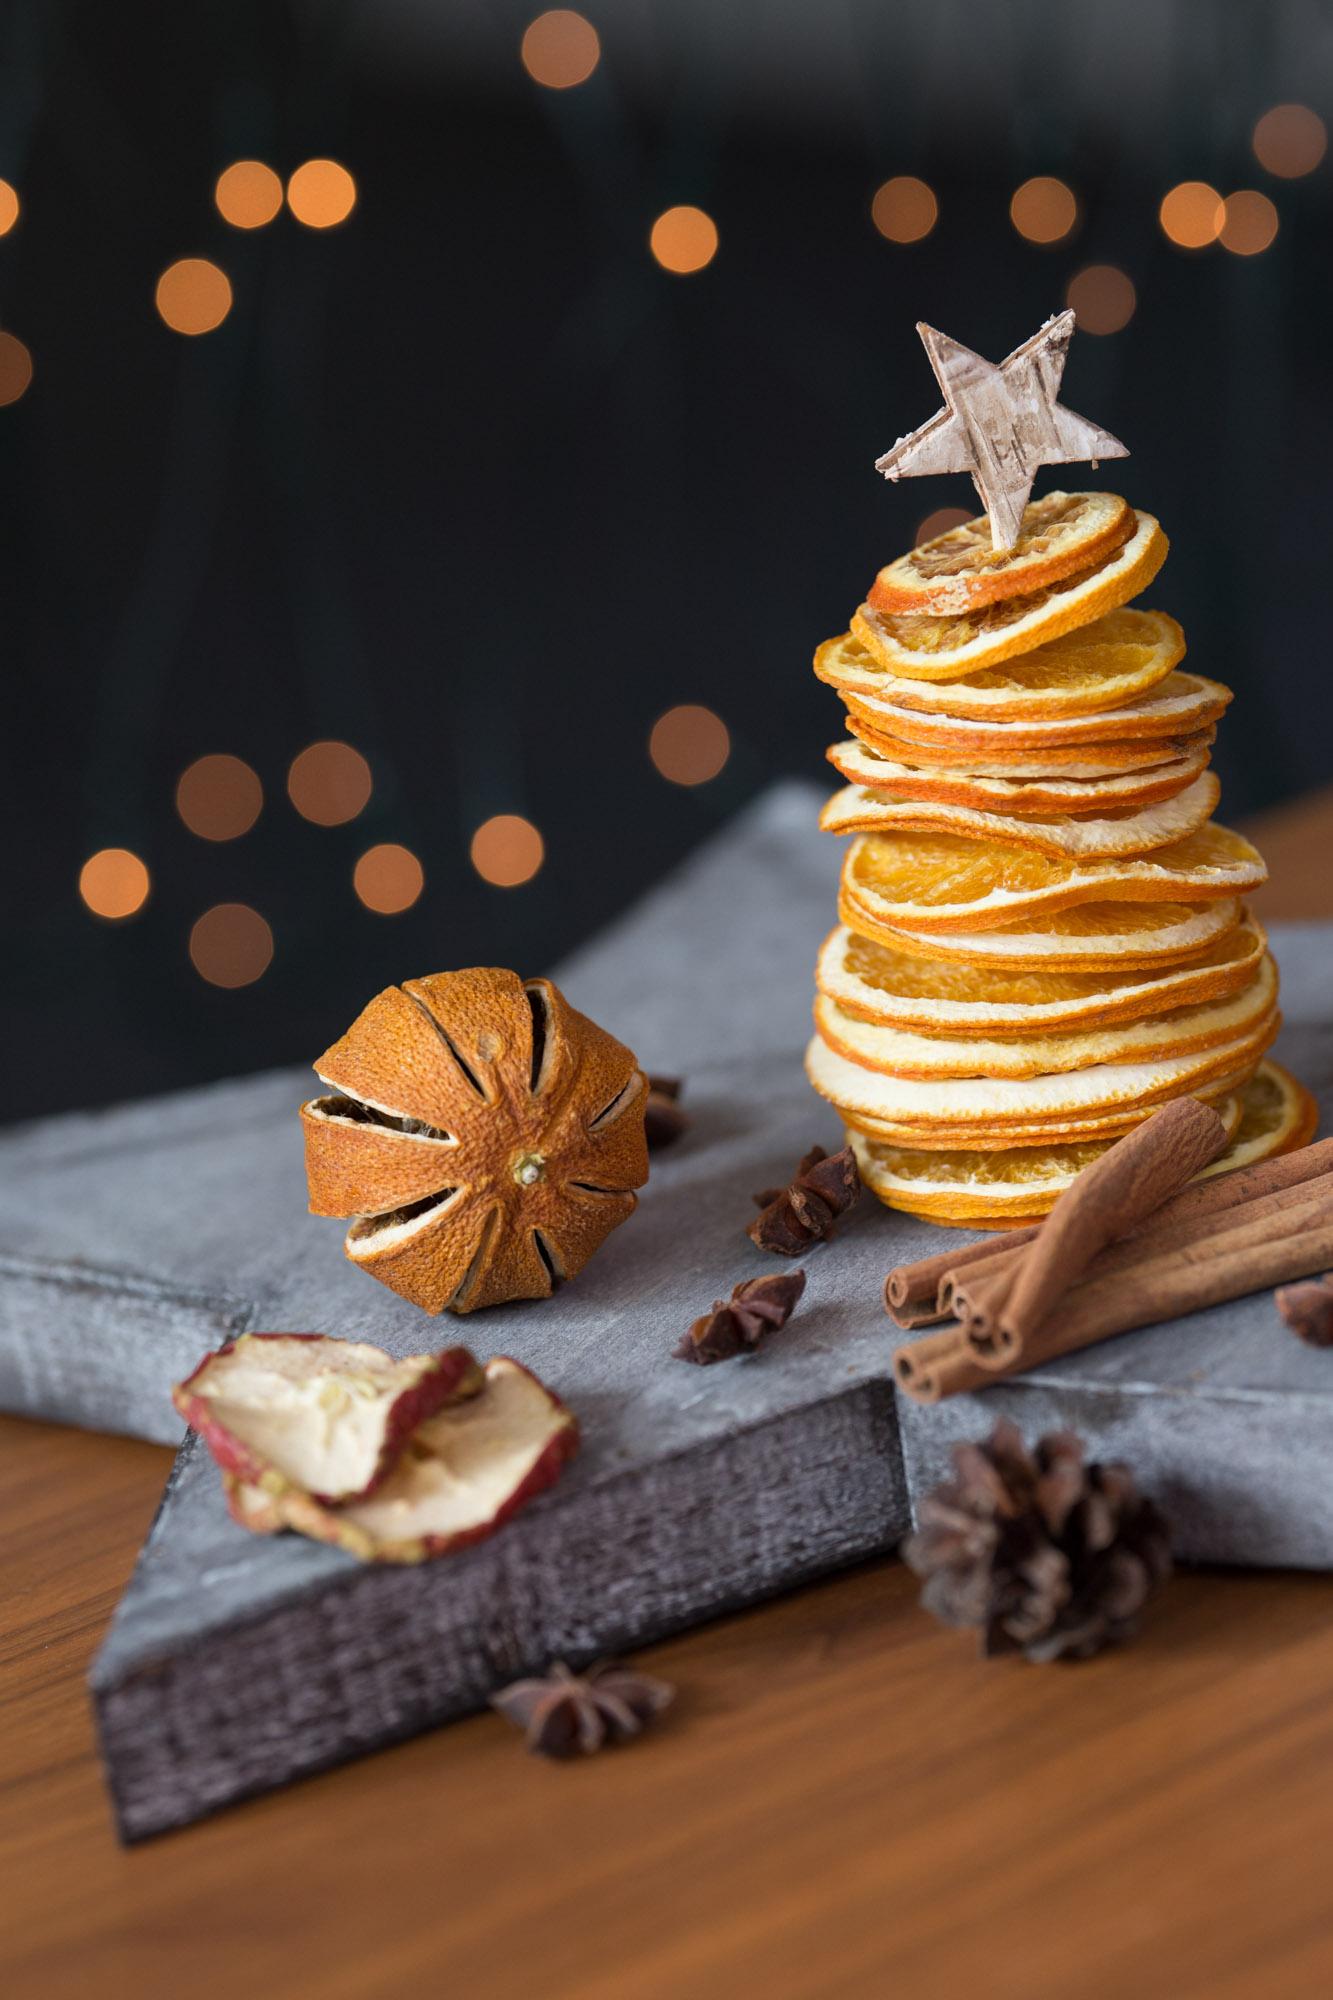 Besondere Weihnachtsmotive © Antonia Moers